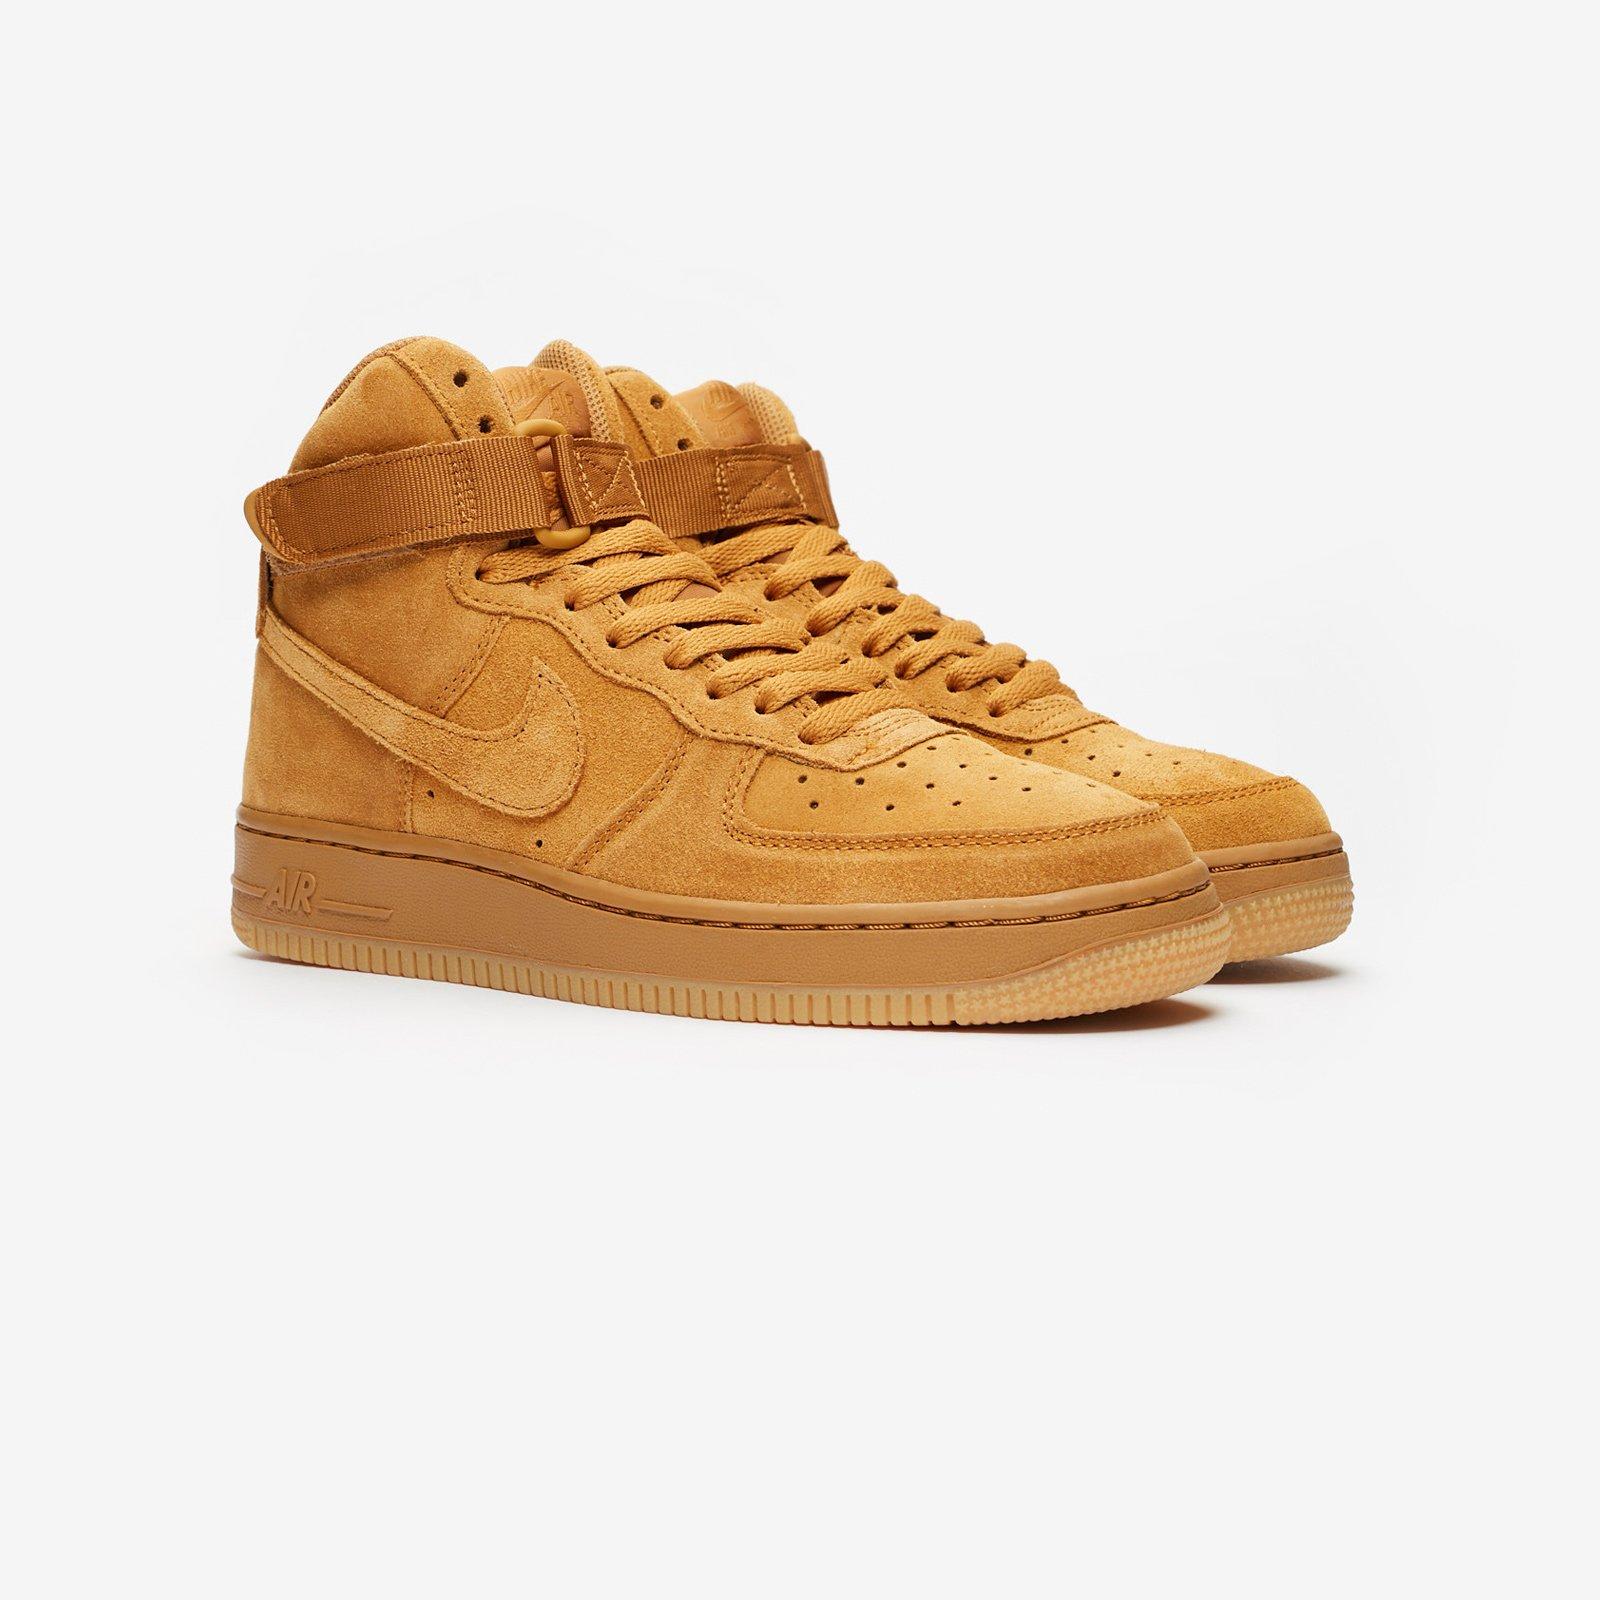 Force Air 1 701 High Sneakersnstuff Lv8gs807617 Nike eWbDE29HIY